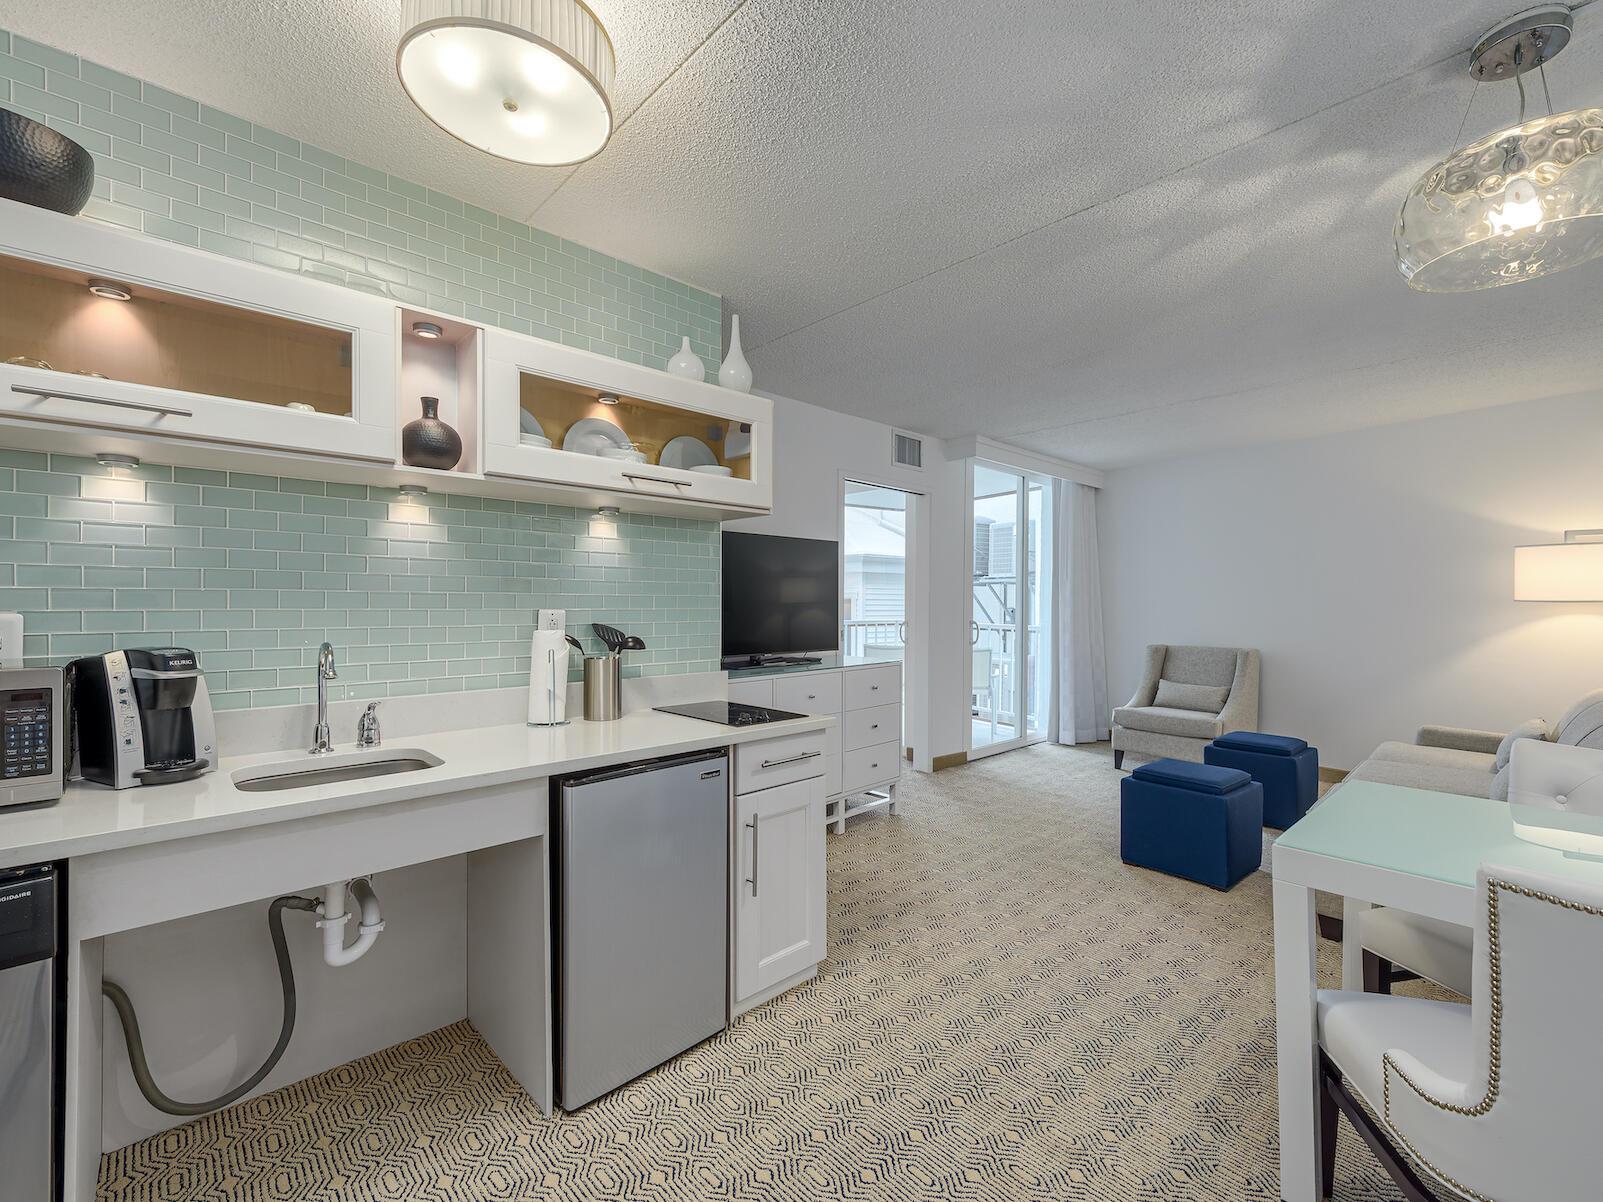 King ADA Handicap Accessible Suite at ICONA Diamond Beach Resort near the Wildwoods NJ